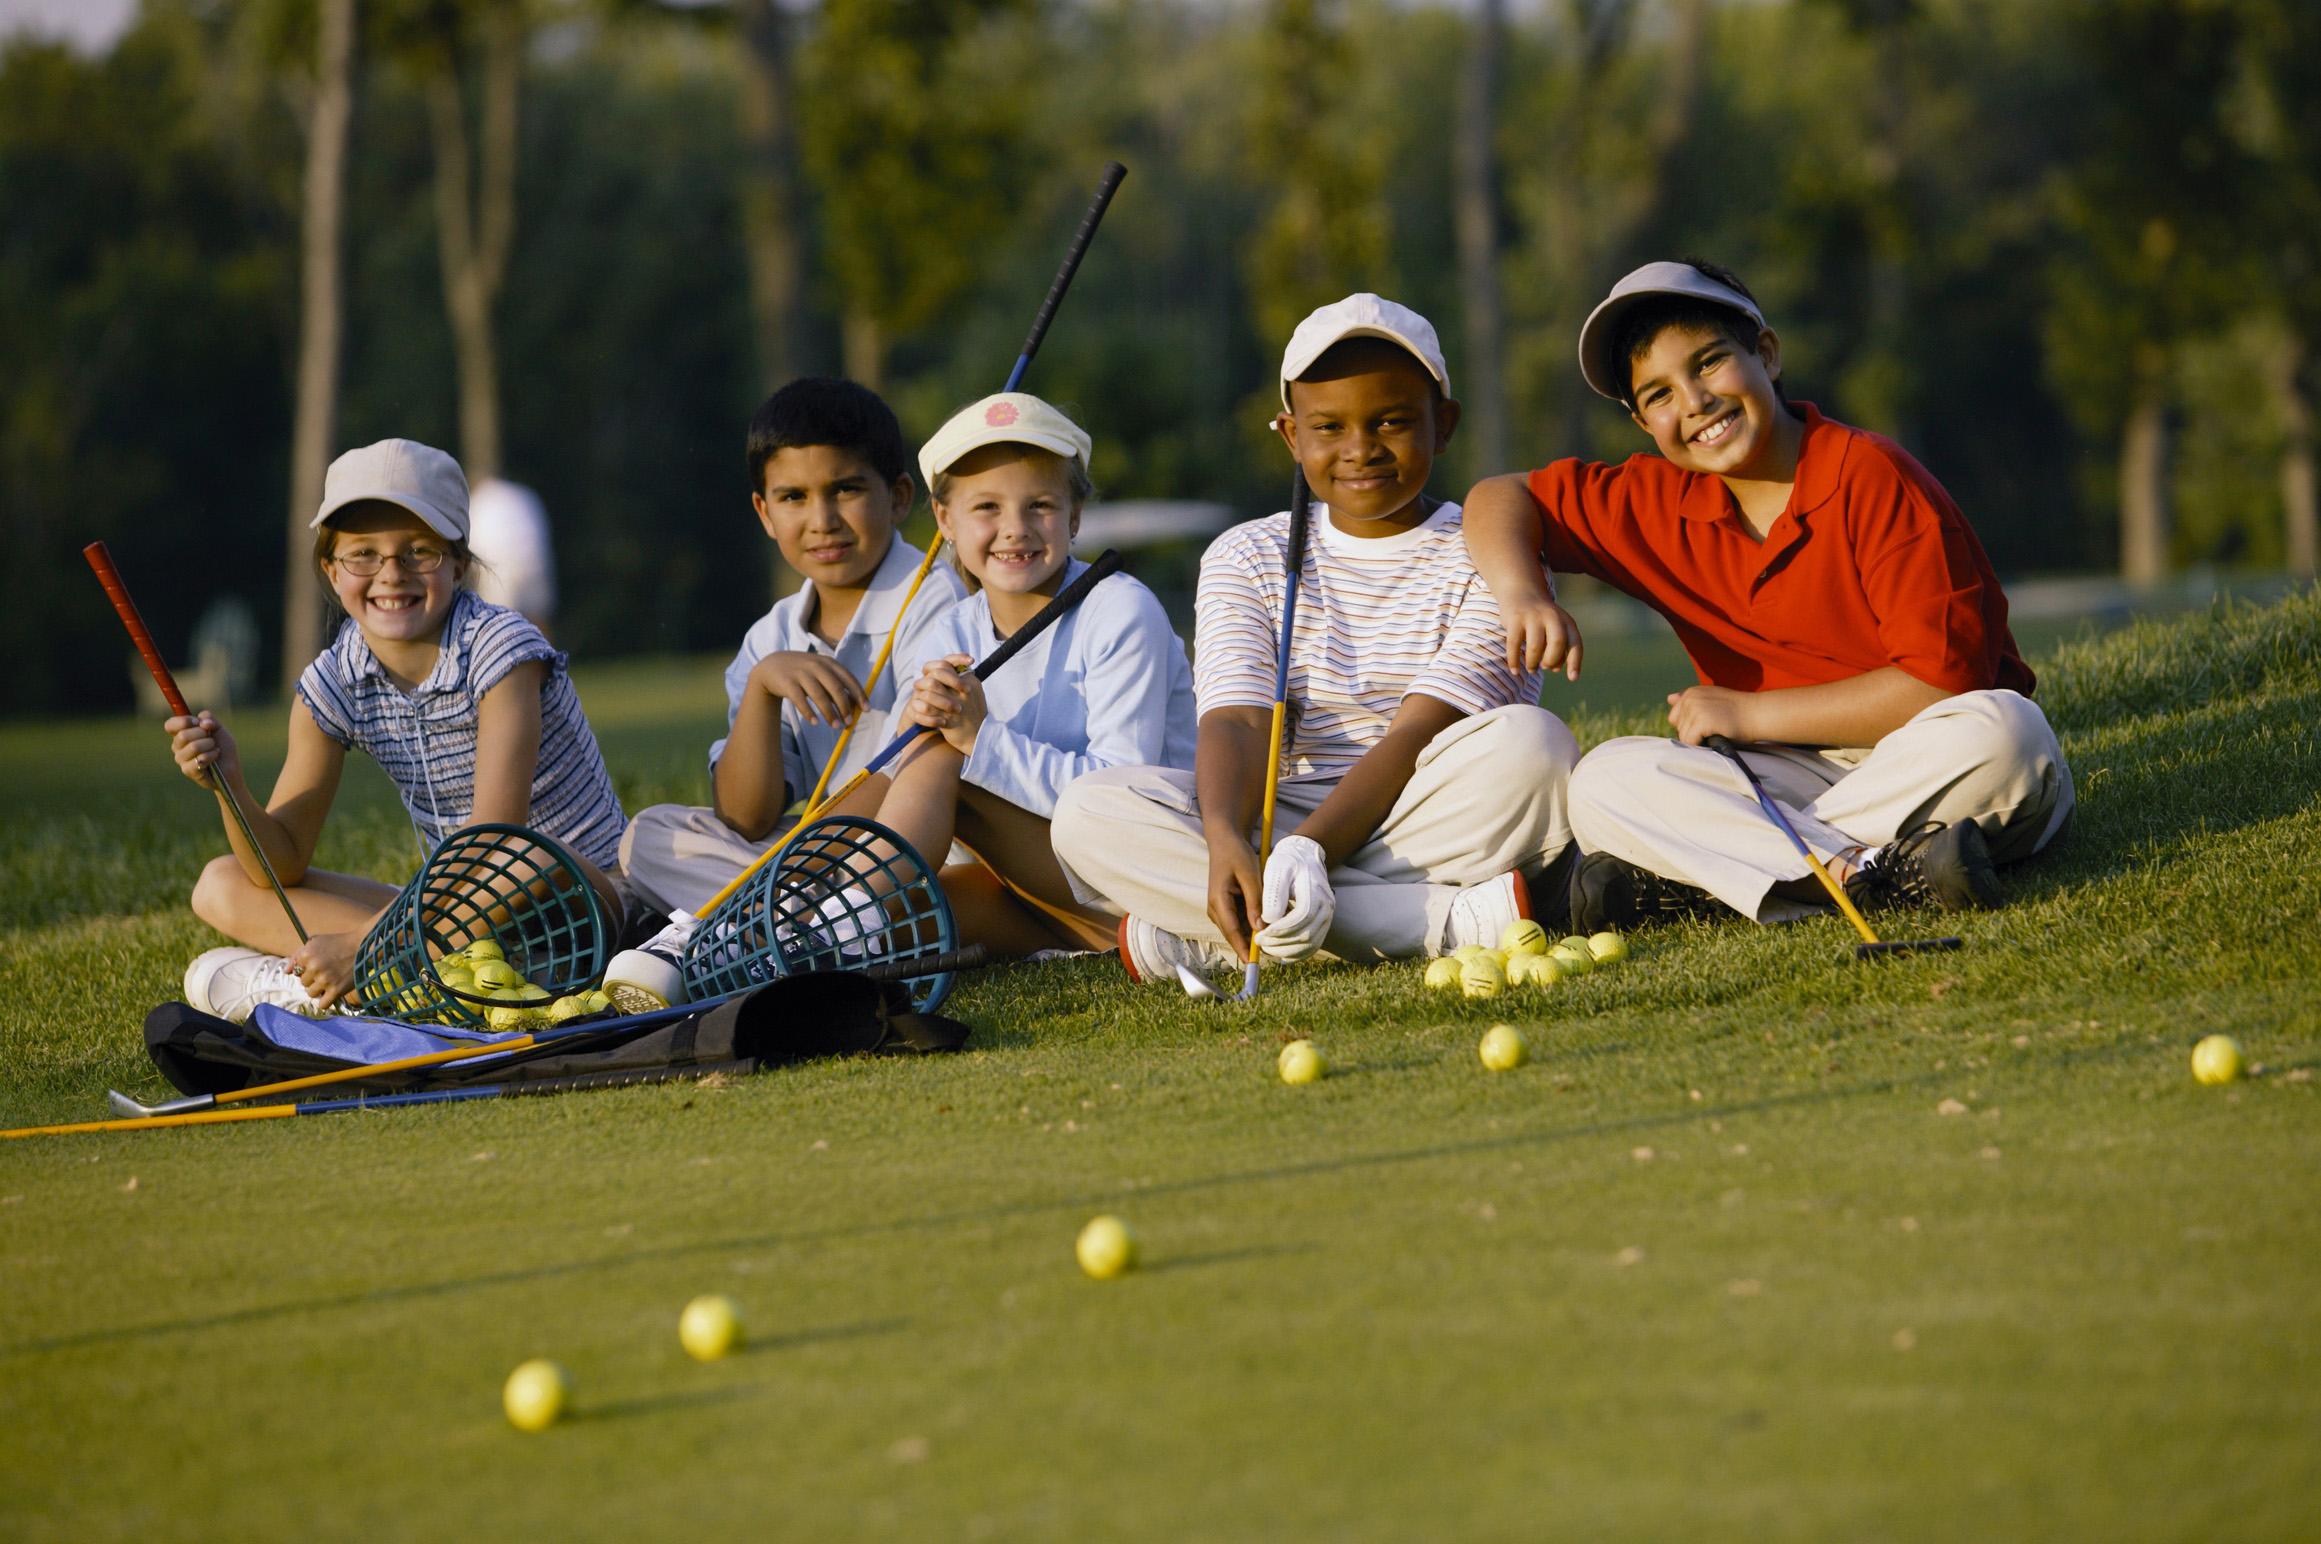 Golf makes friendships!